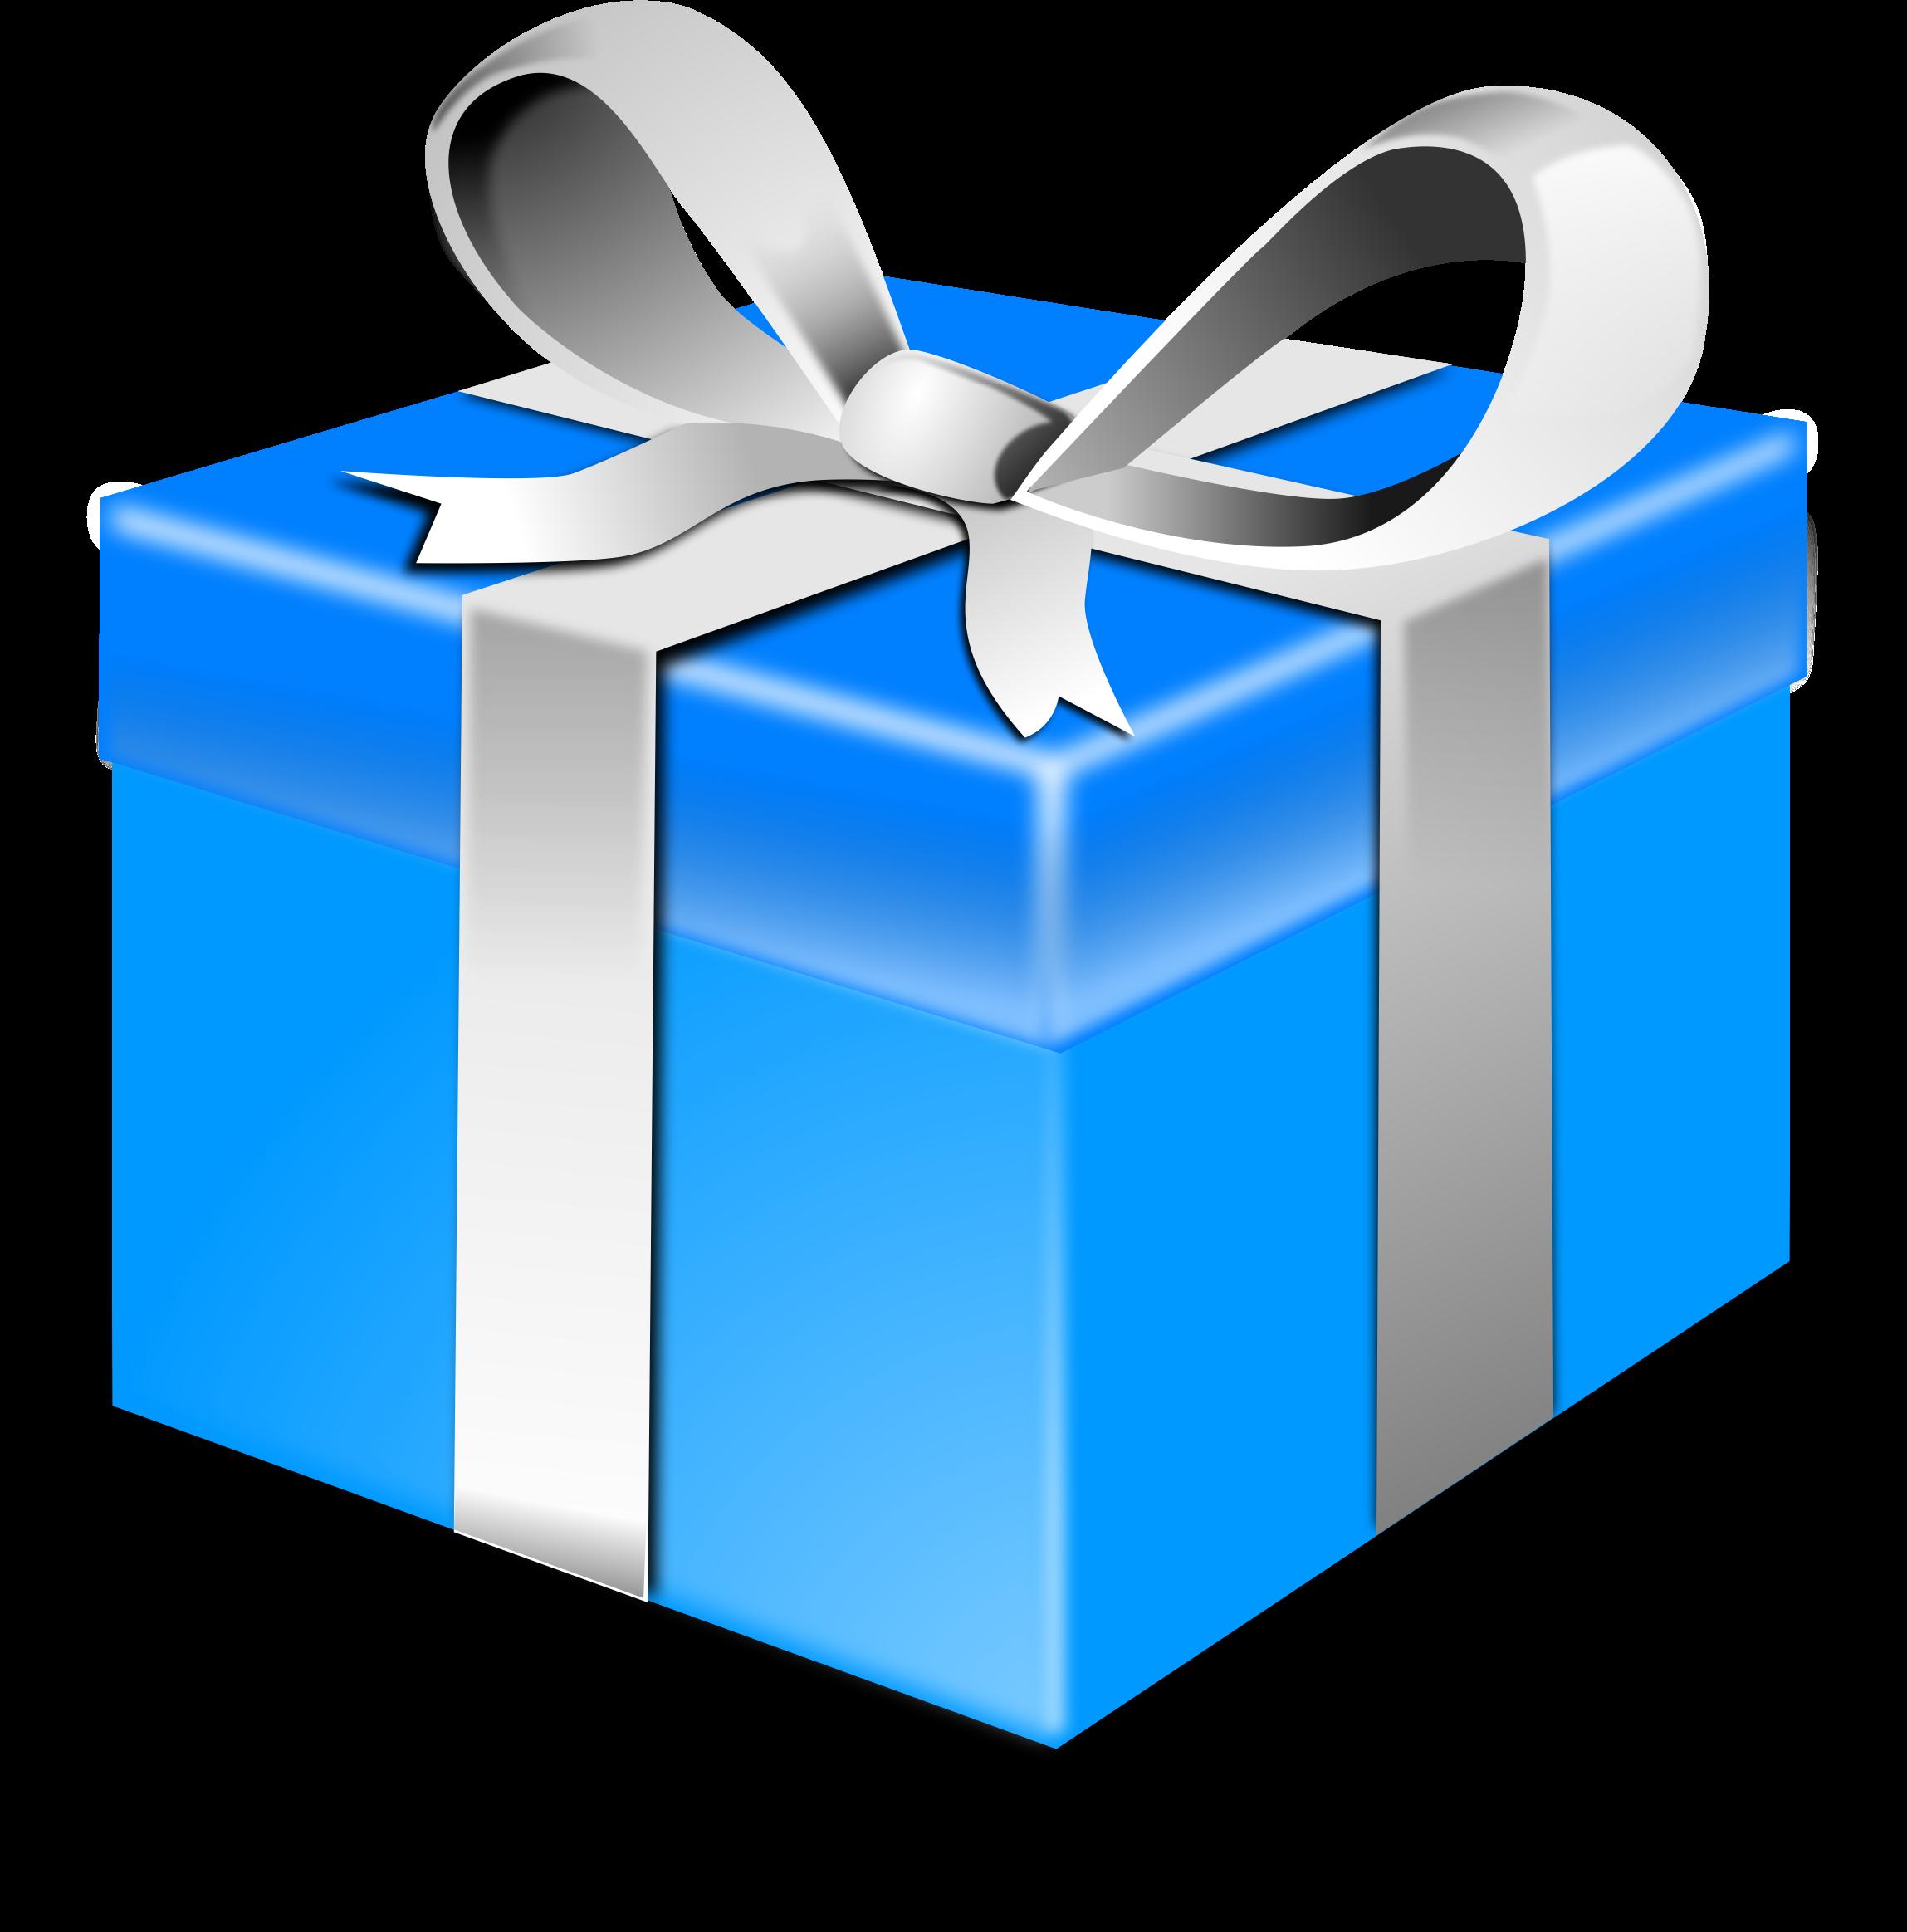 image for free blue present box high resolution clip art rh pinterest com au high resolution clipart software high resolution clipart of us coins